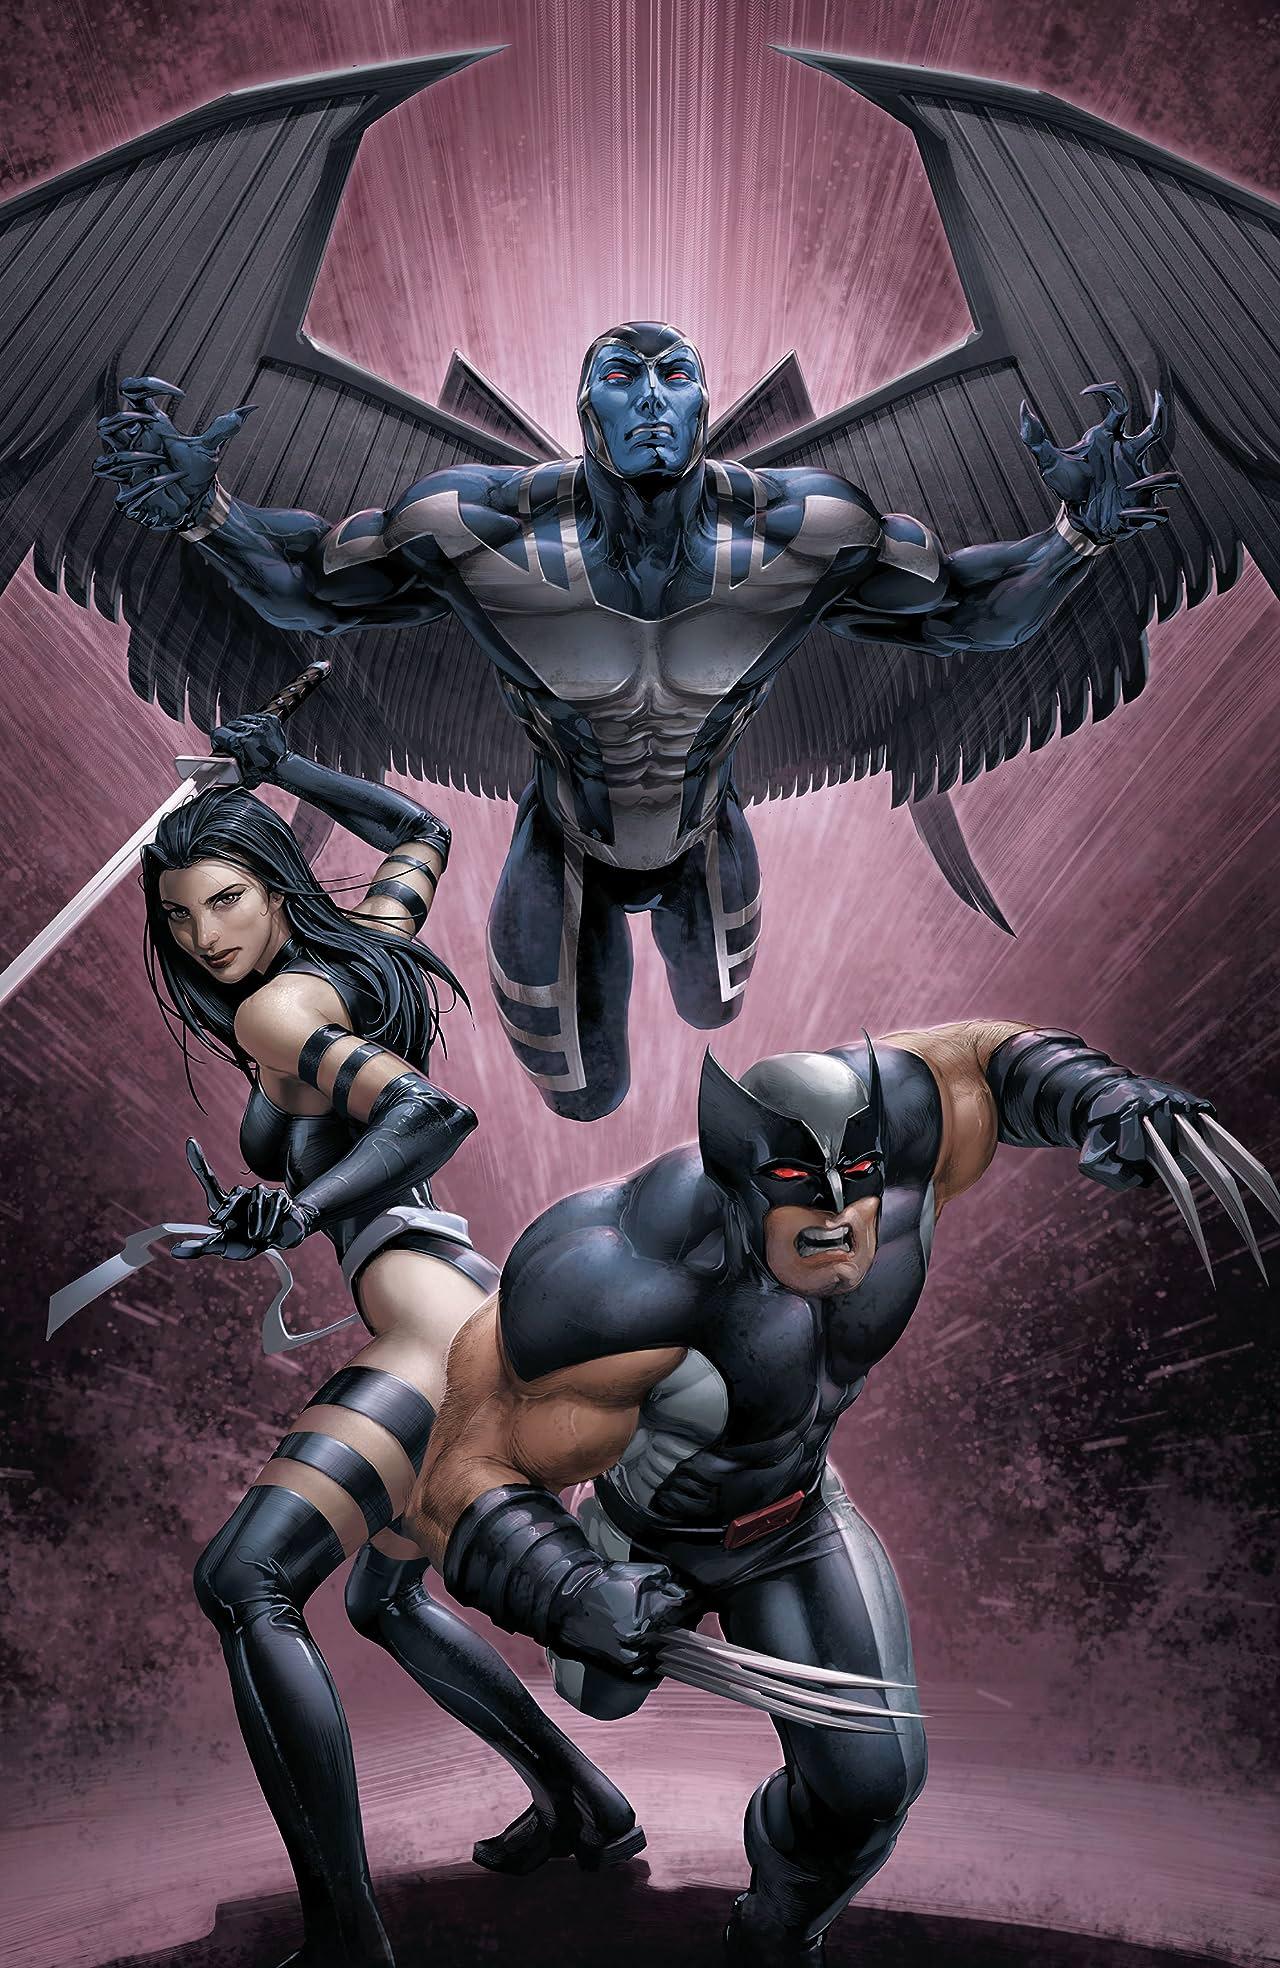 Uncanny X-Men: The Variant Covers #1